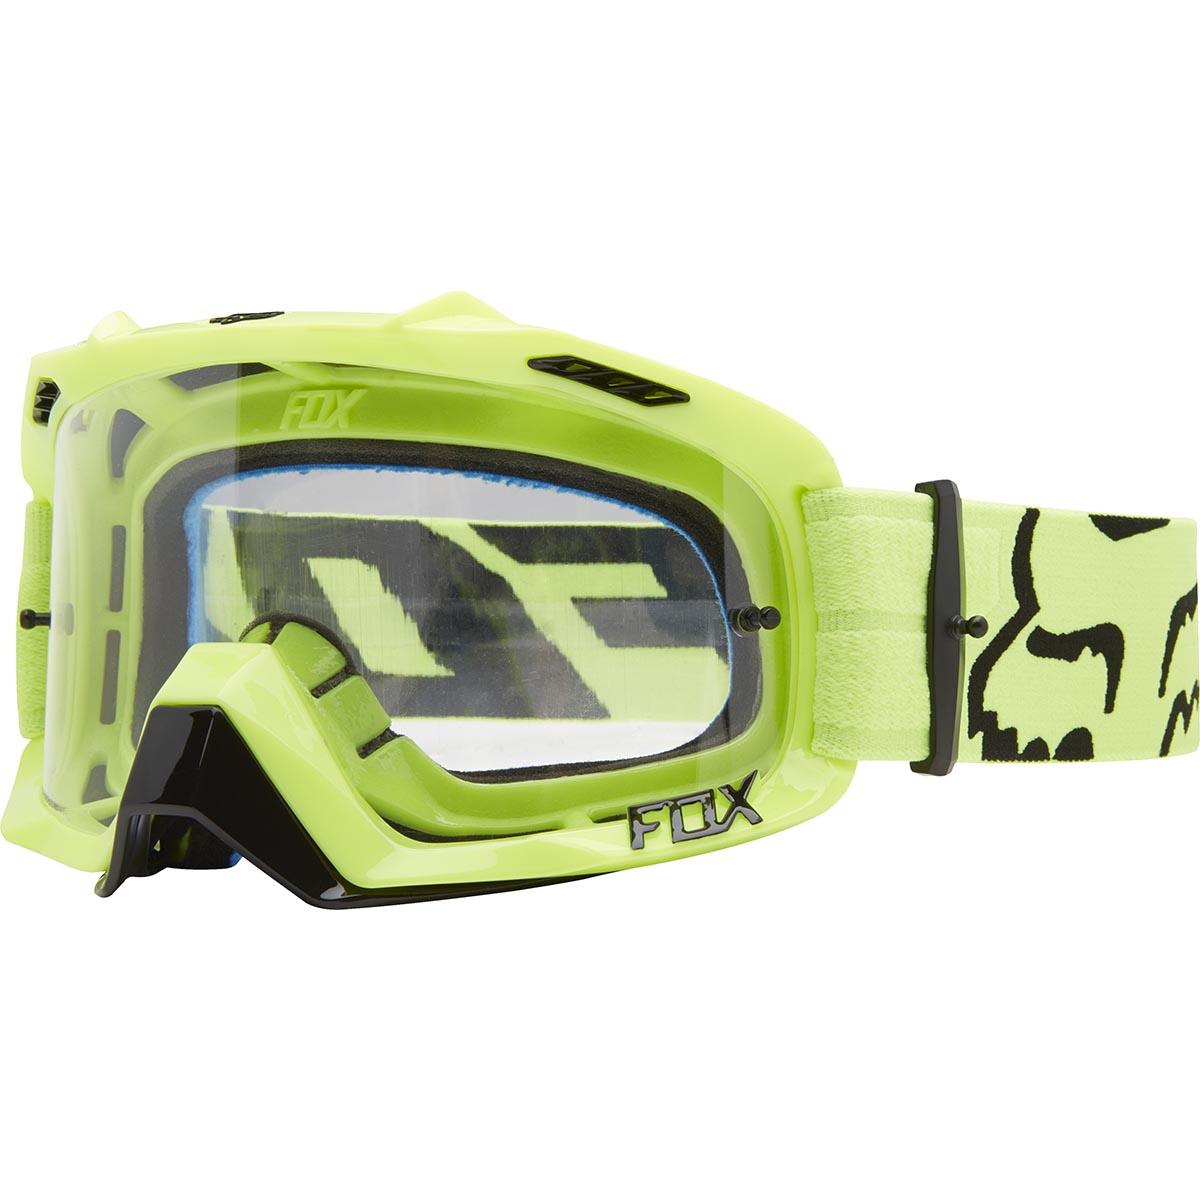 Fox - AIR DEFENCE Race Flo Yellow очки, прозрачная линза